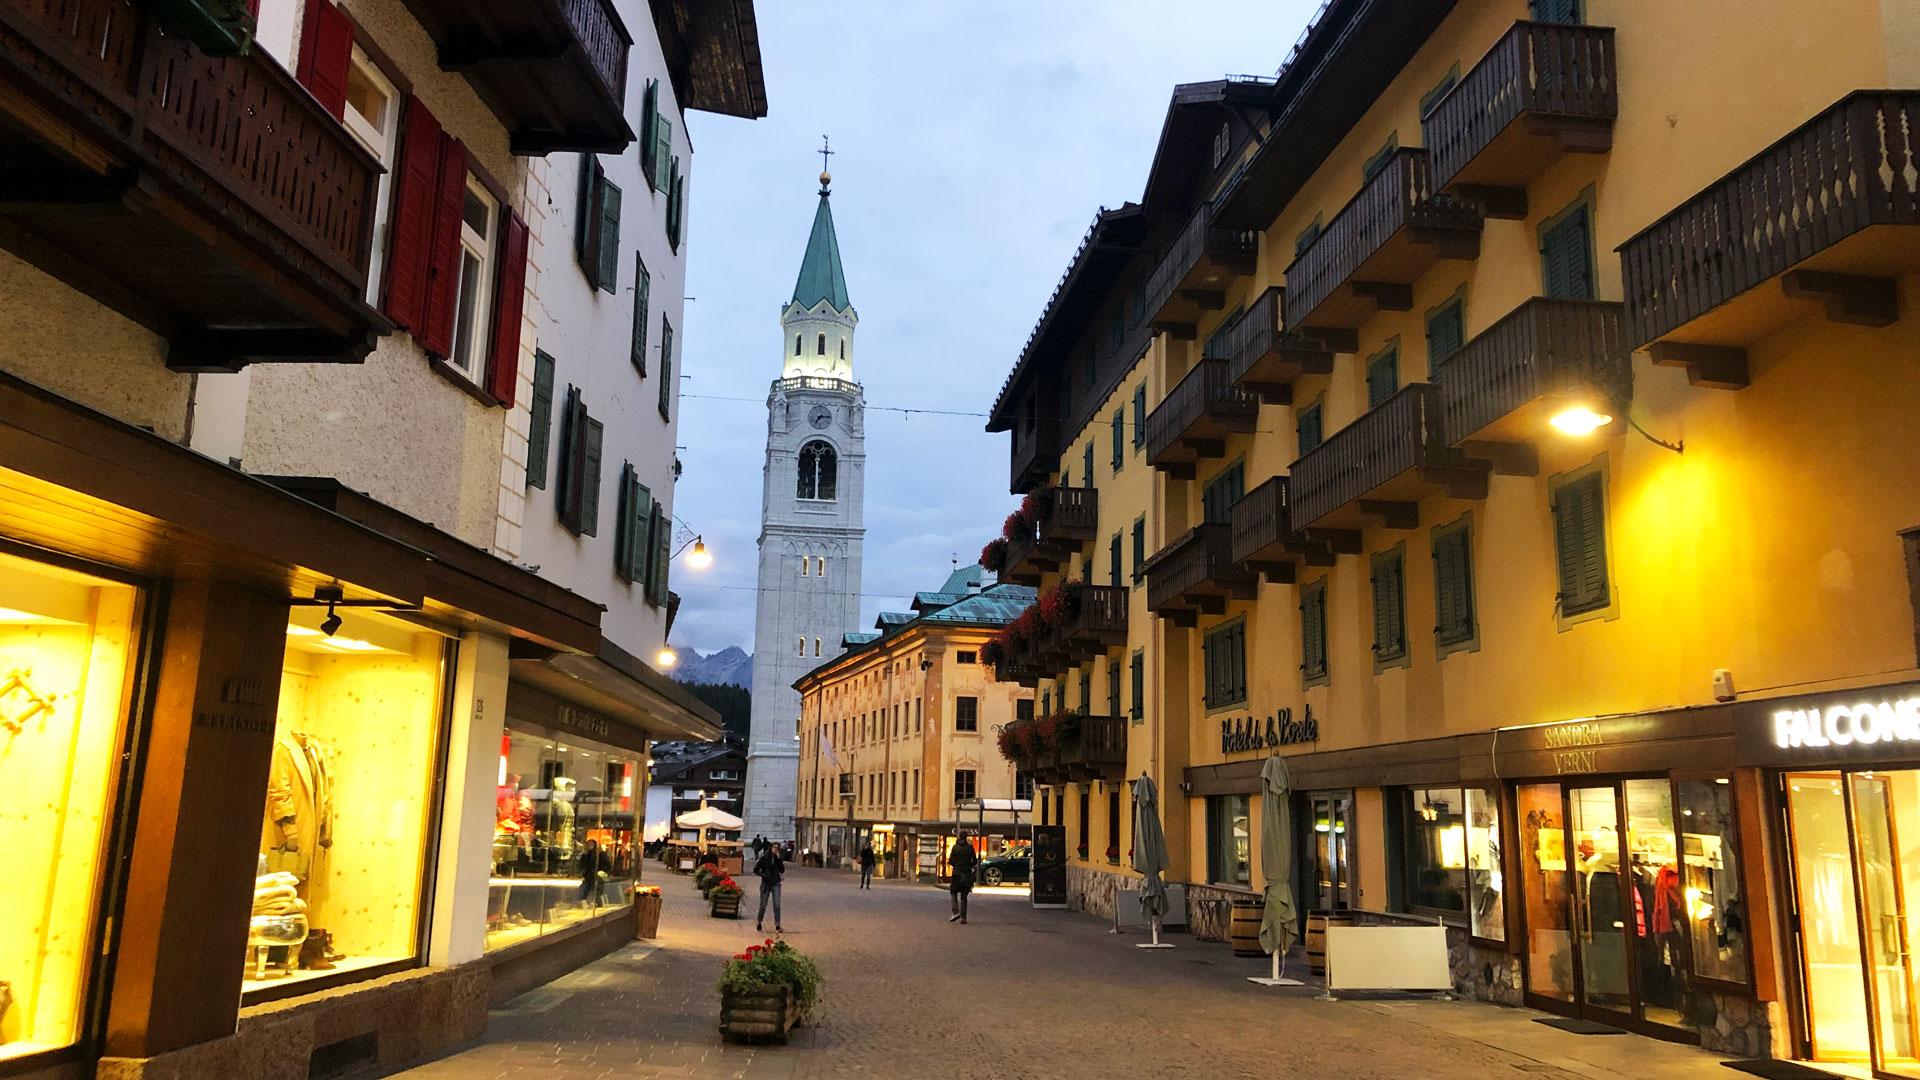 wp-content/uploads/itineraries/Dolomites/dolomites-cortina-2.jpg